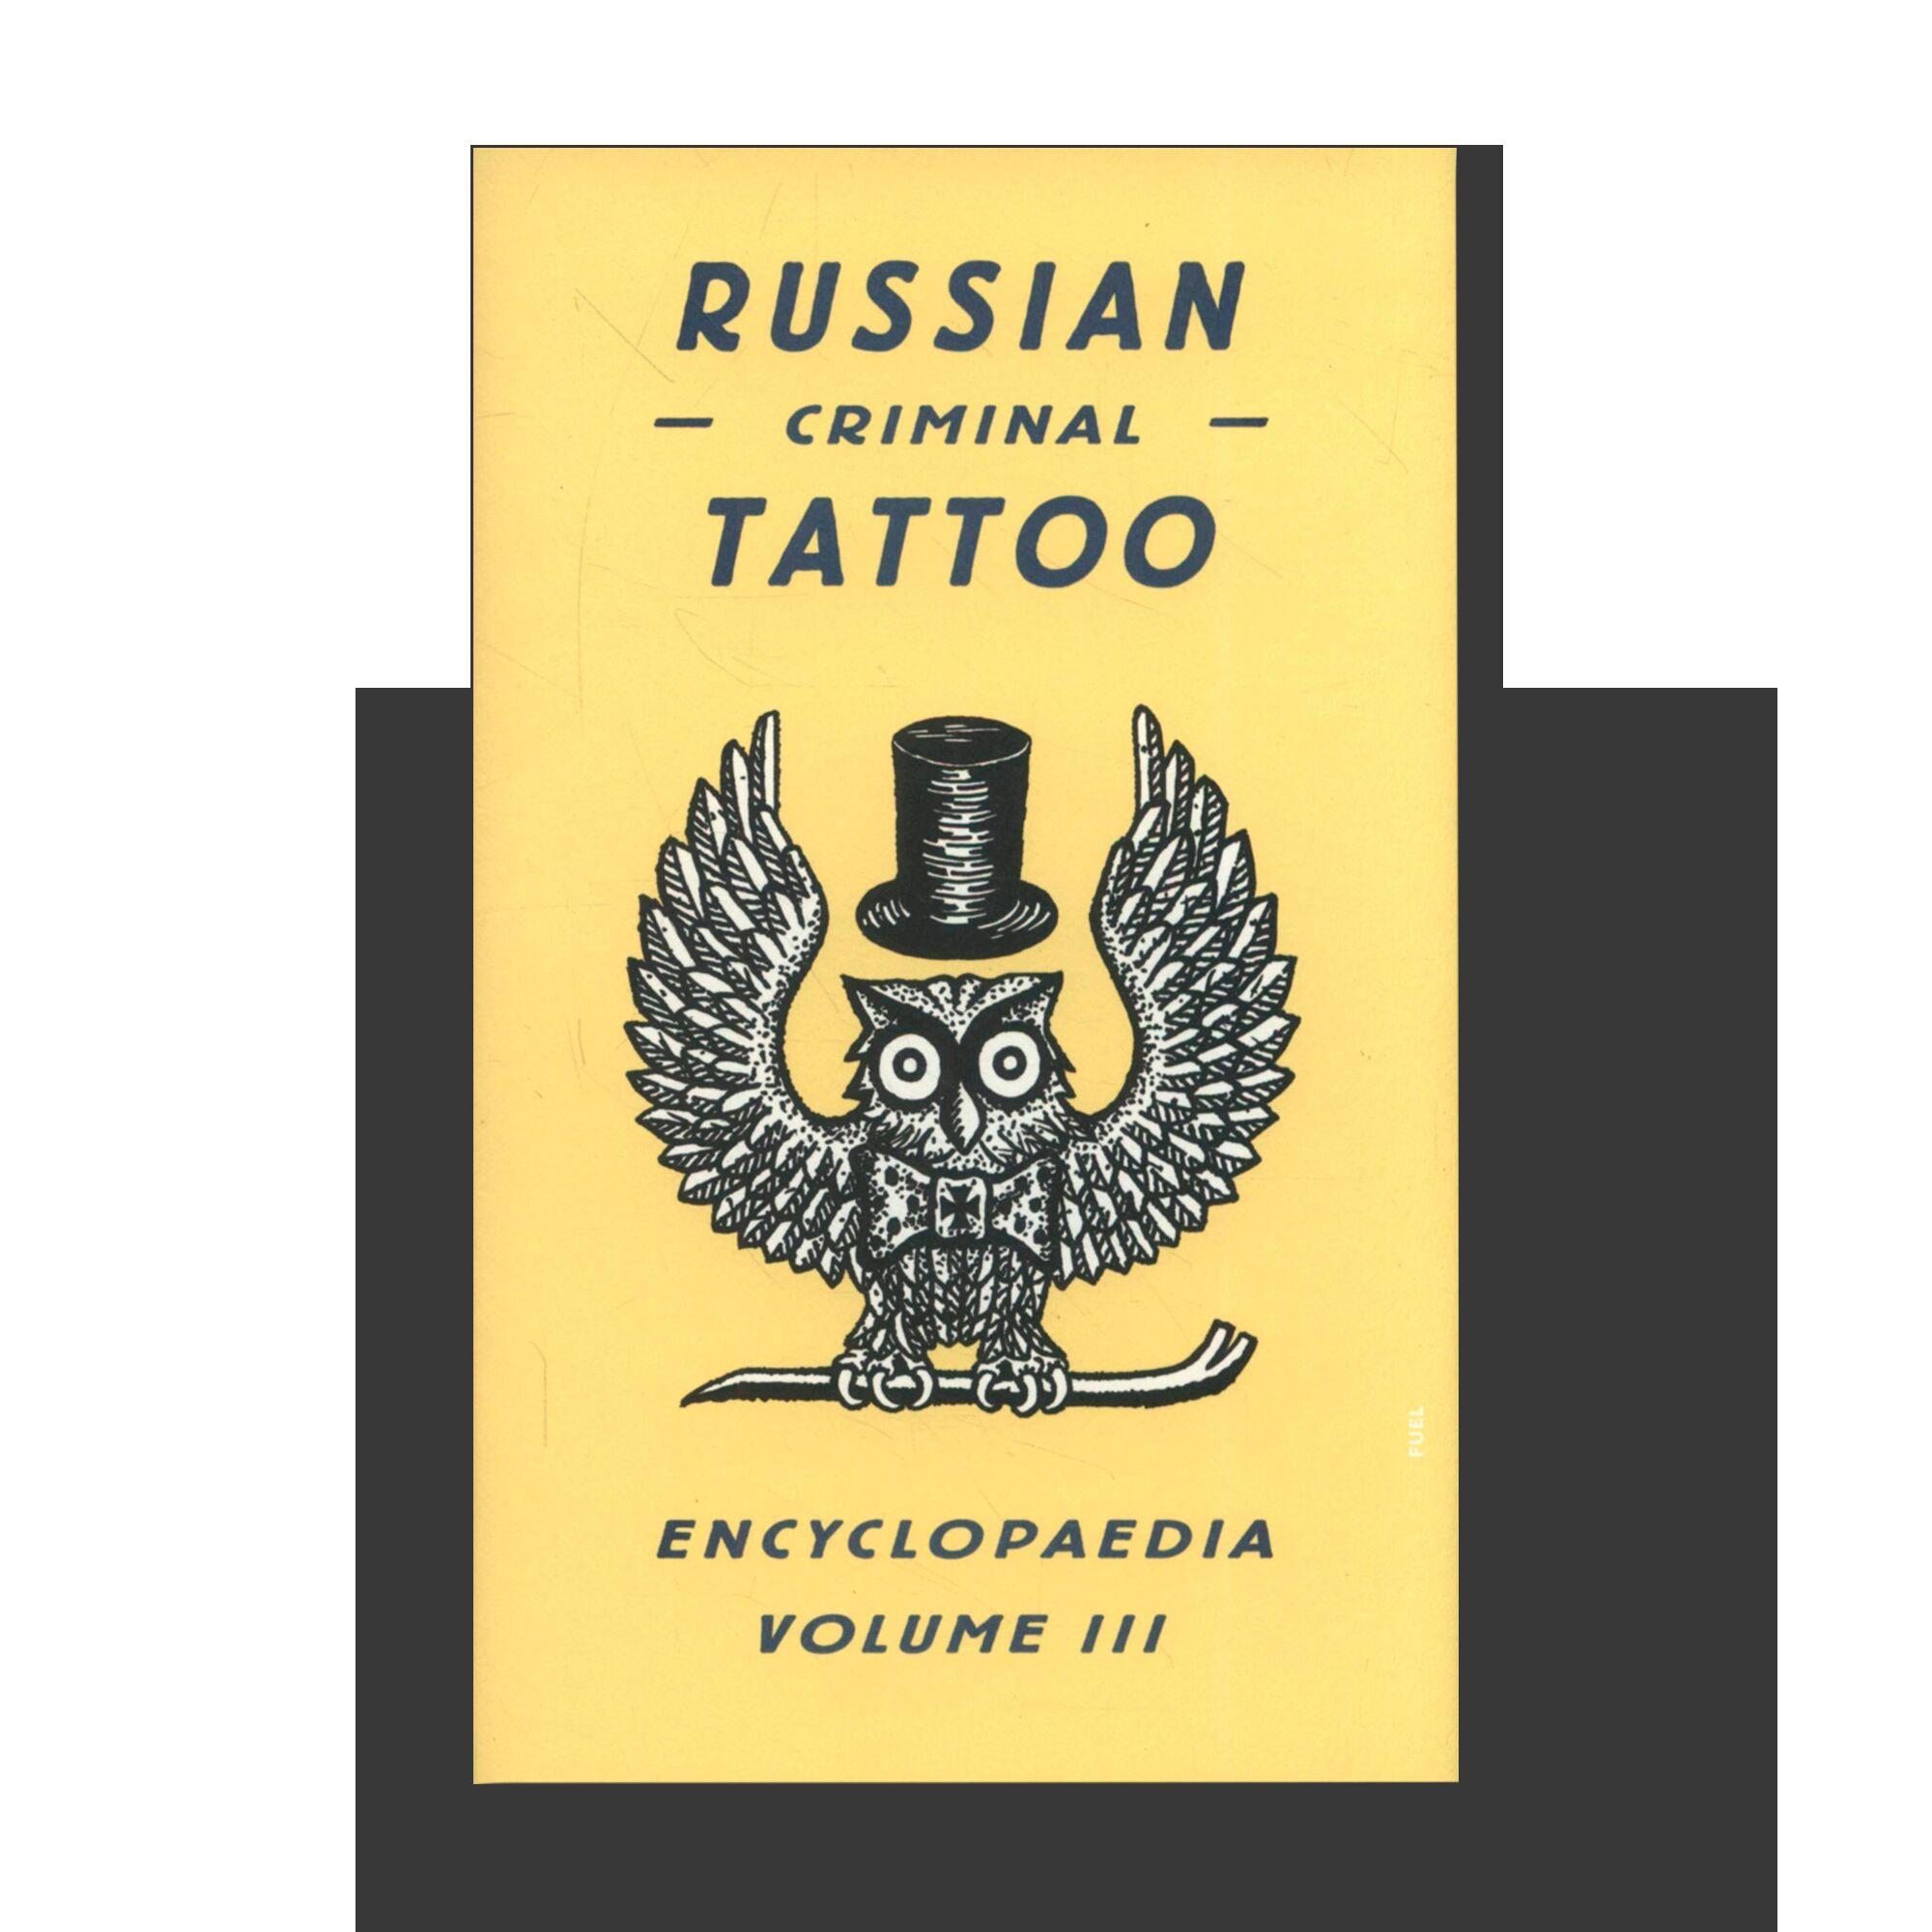 Russian Criminal Tattoo Encyclopedia. Volume III